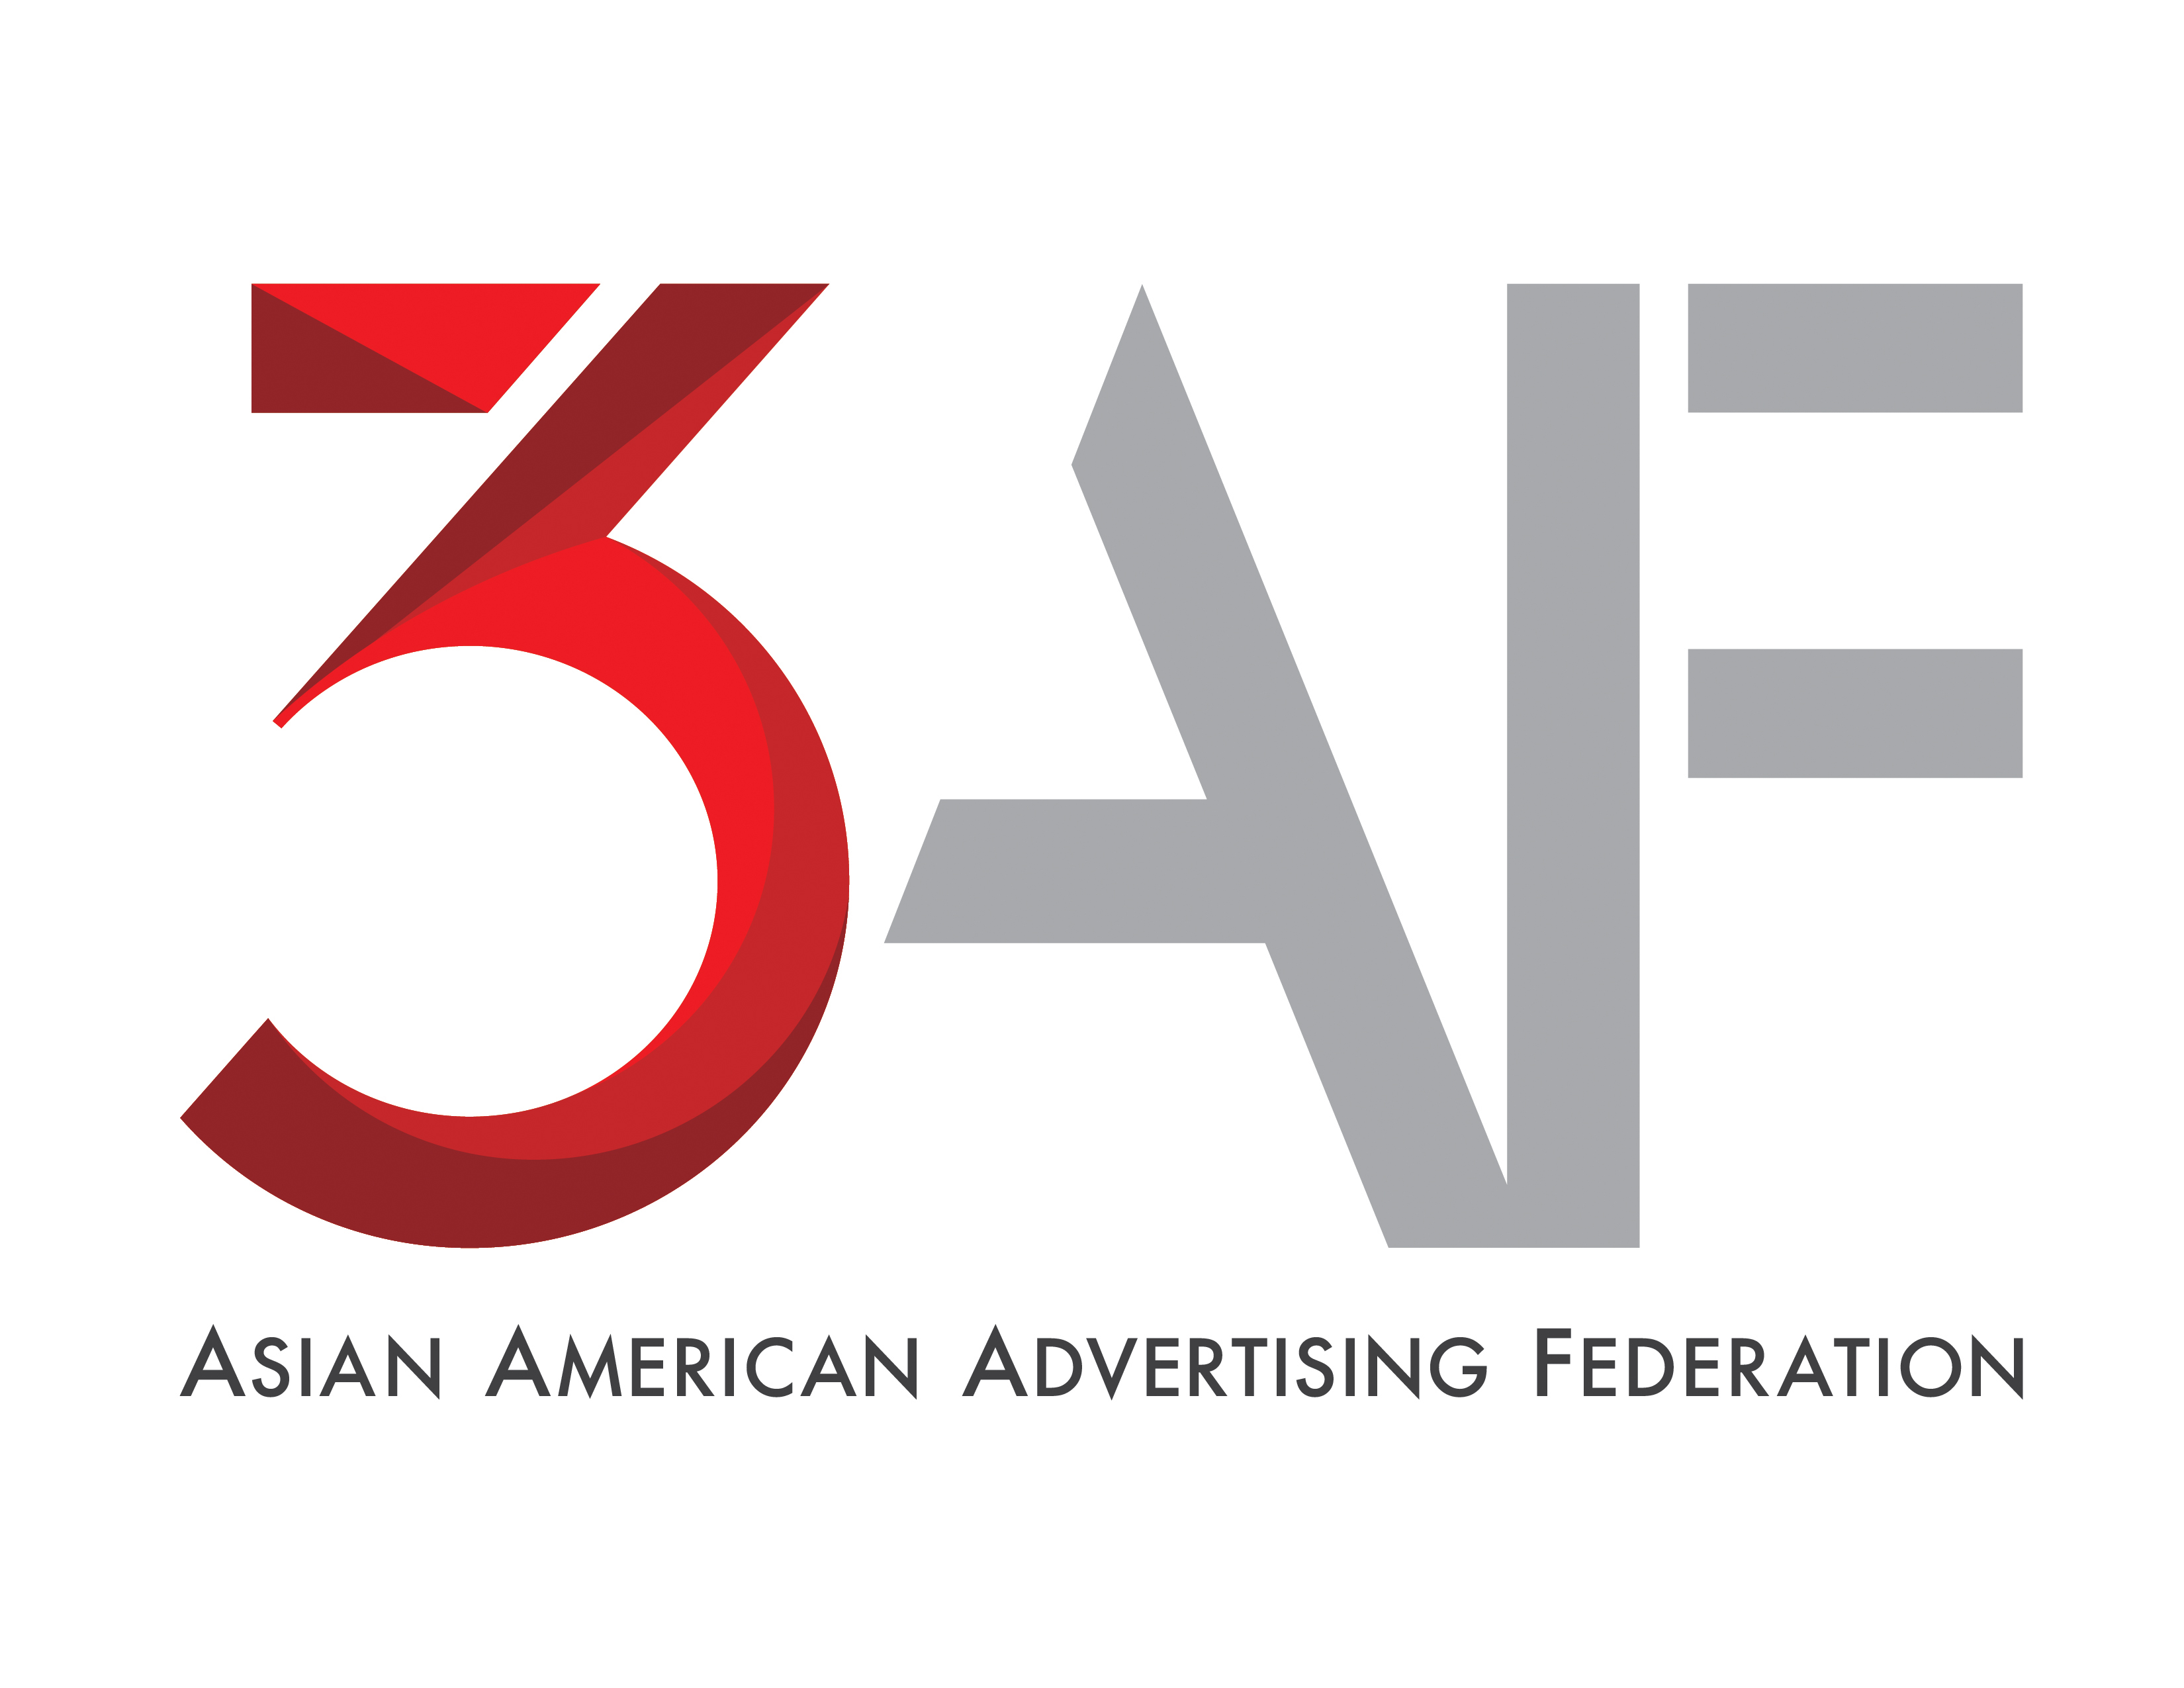 Asian American Advertising Federation (3AF)